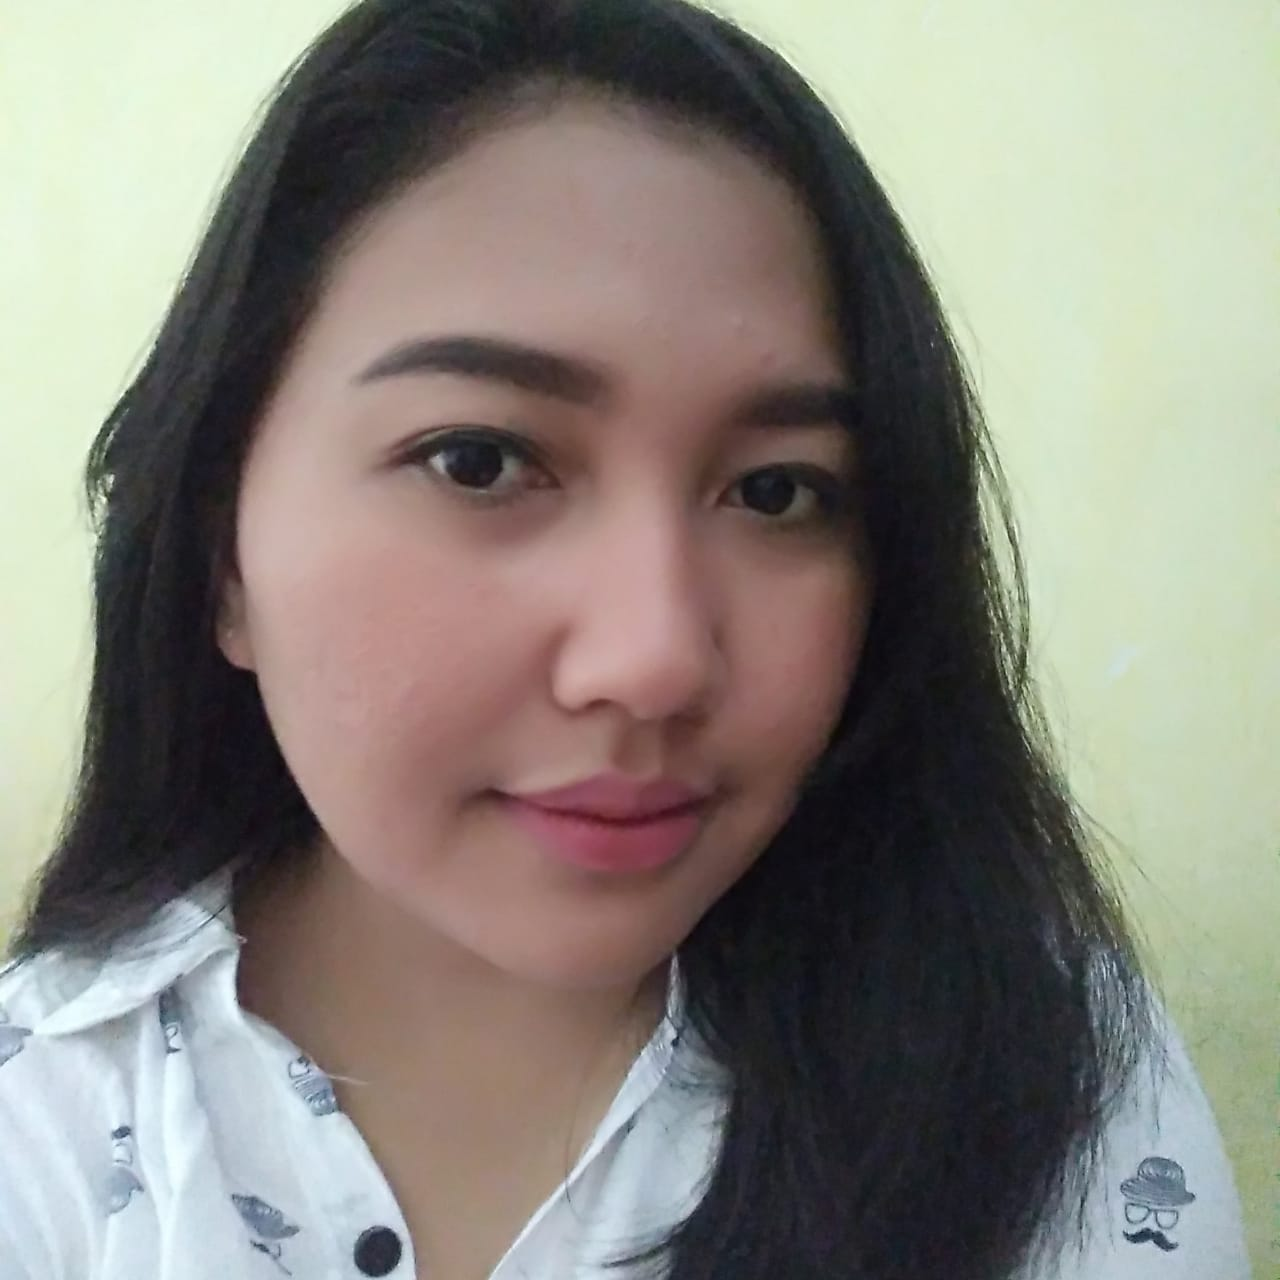 Pilkada Serentak 2020, Kahiyang Ayu Siregar Idaman Para Ibu Kota Medan